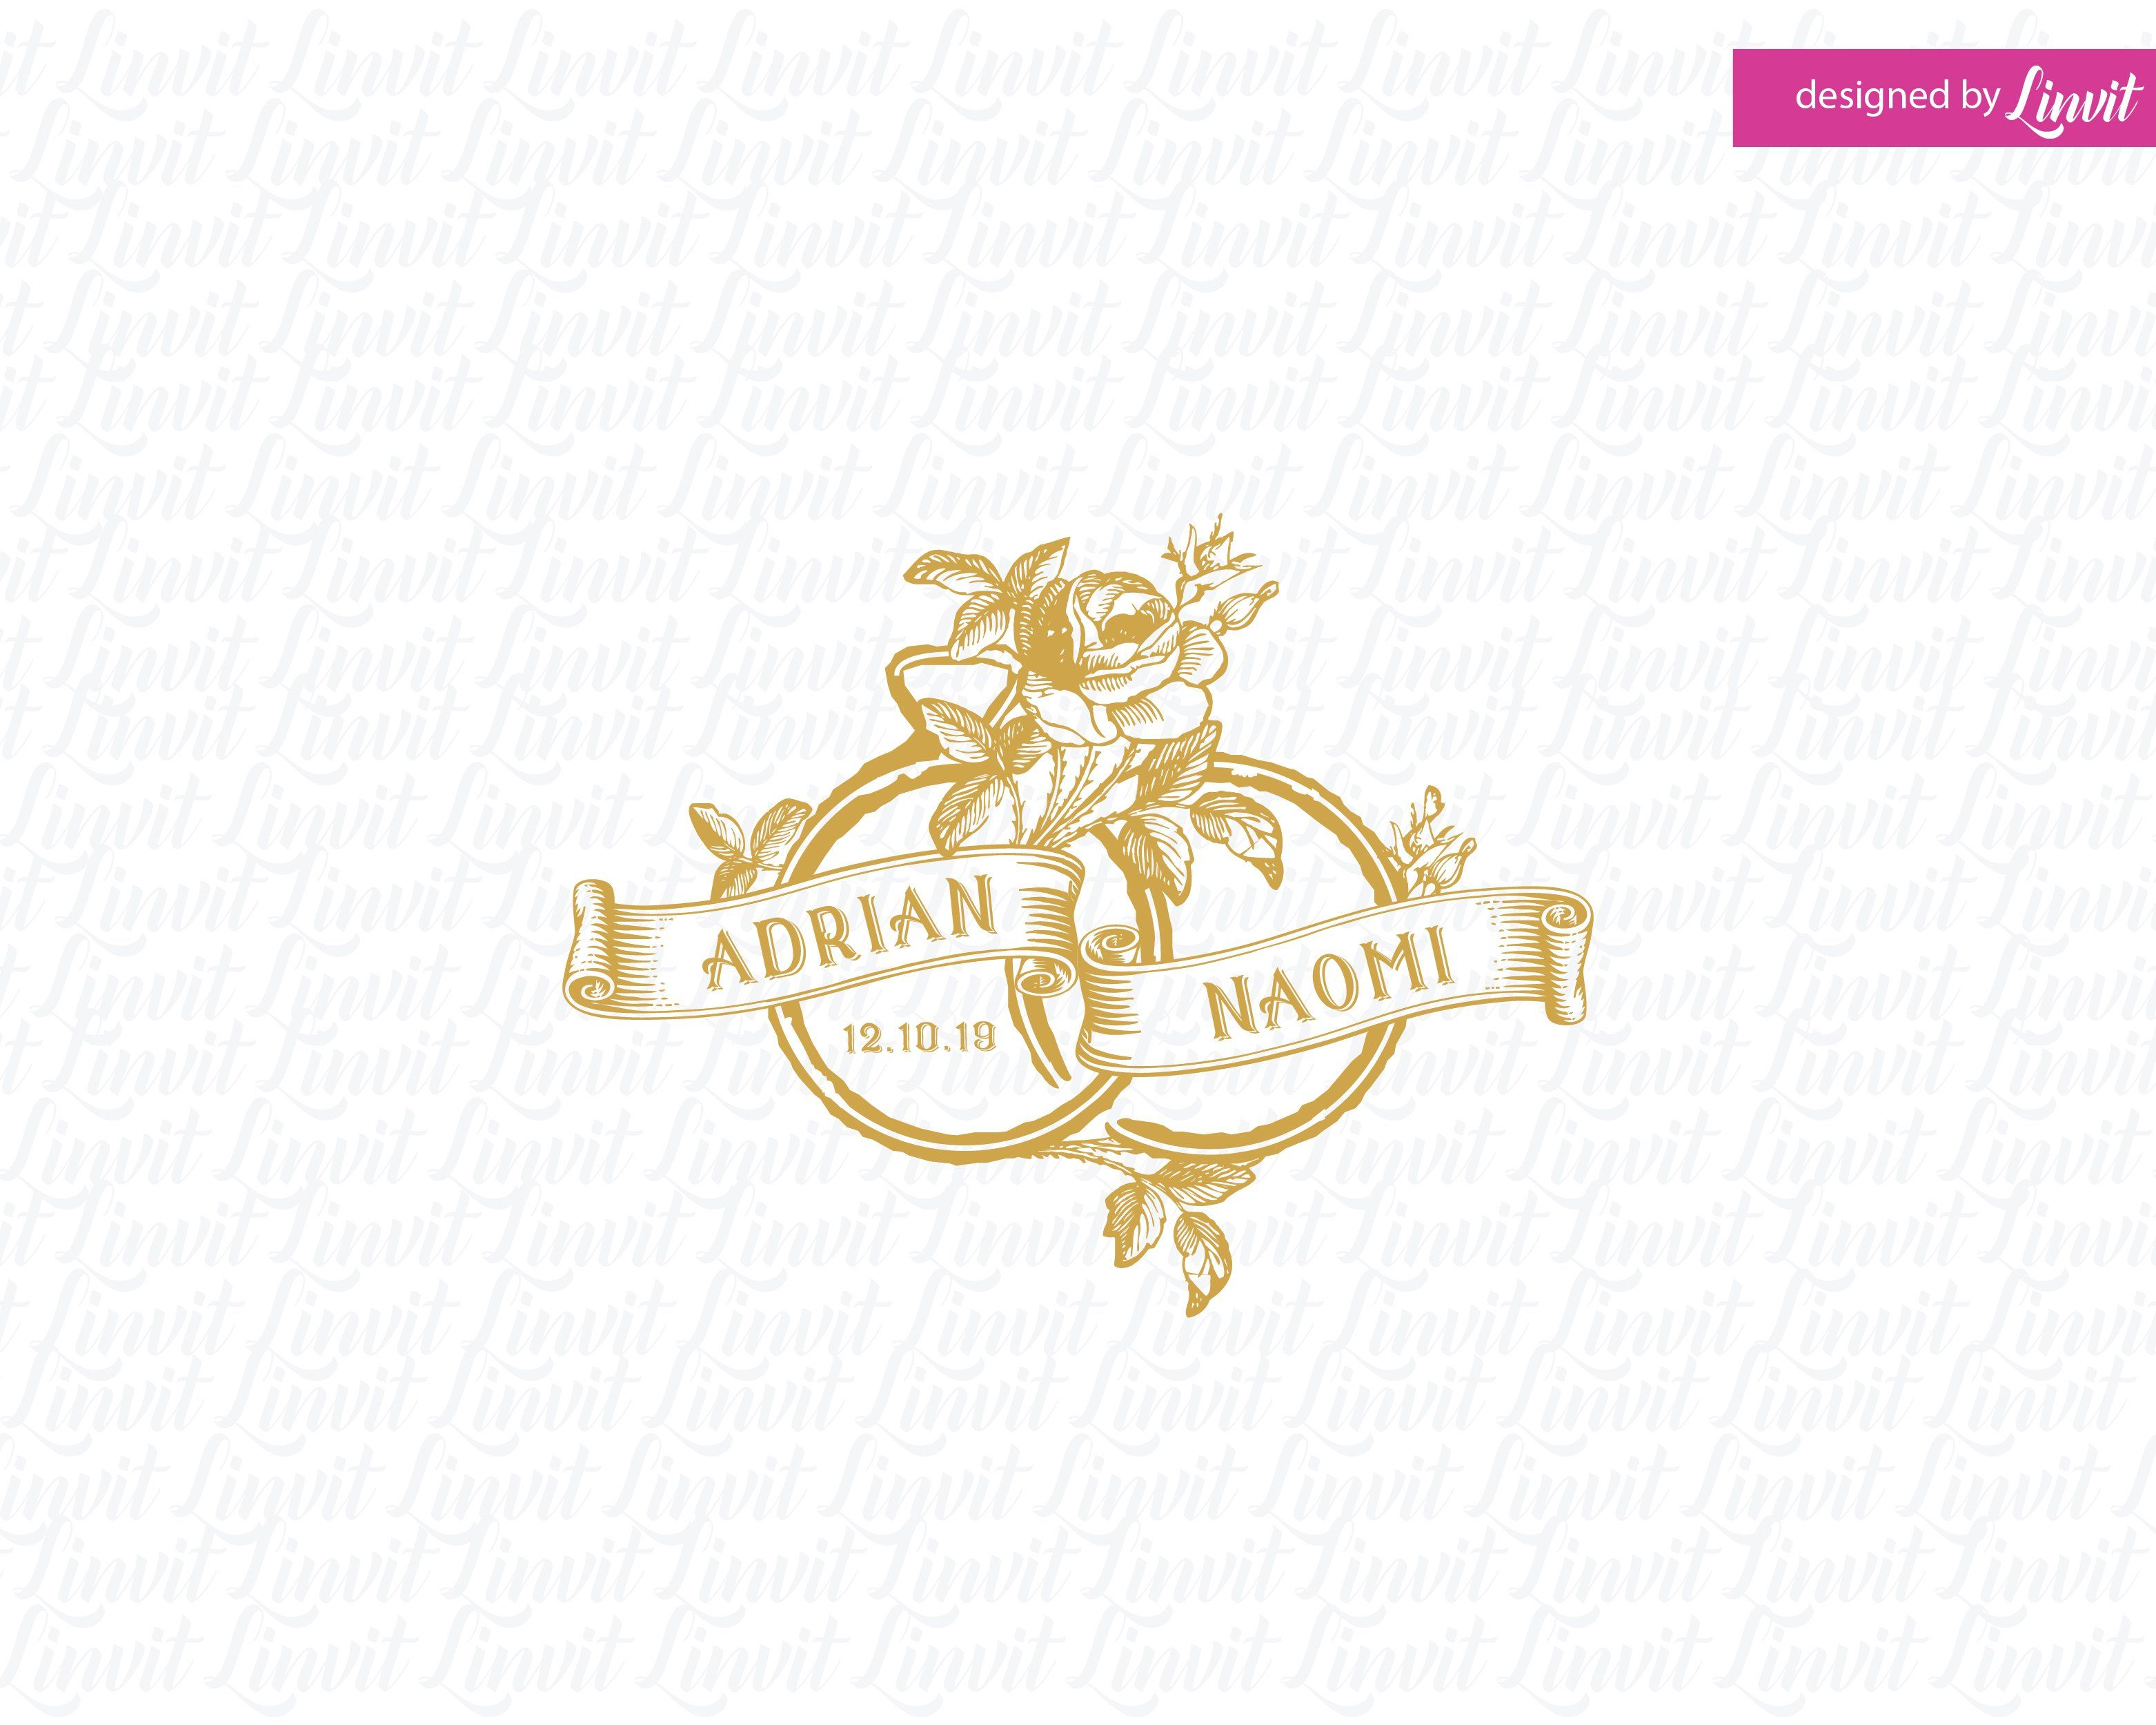 vintage logo vintage wedding monogram Vintage wedding logo vintage wedding crest vintage custom logo vintage wedding template